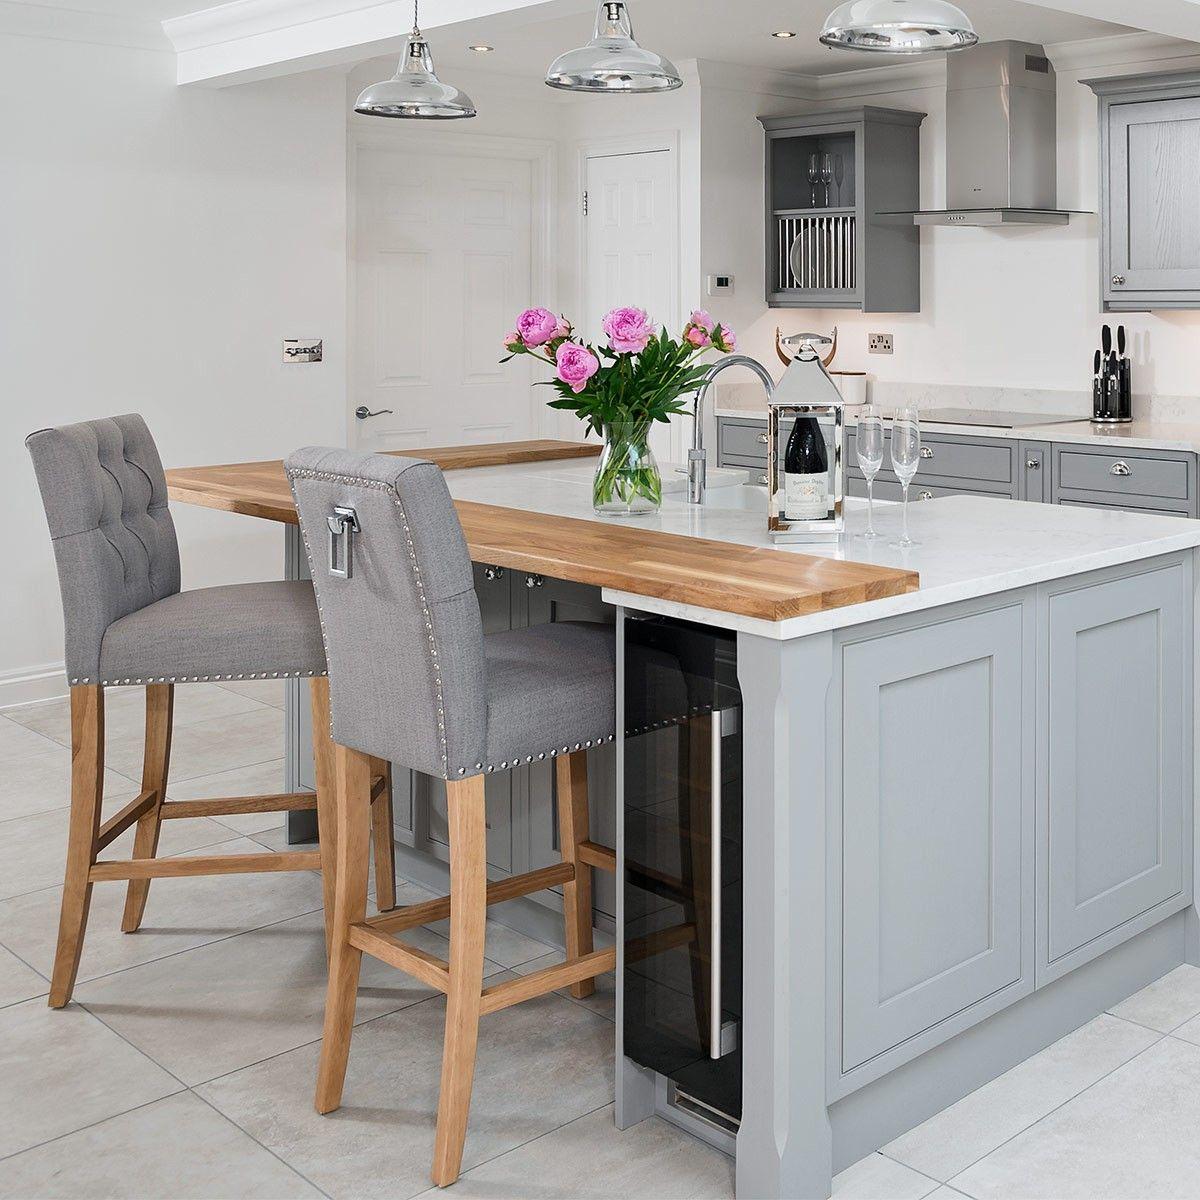 20 Ideas For Grey Kitchens Both: Barrington Oak Stool Grey Fabric